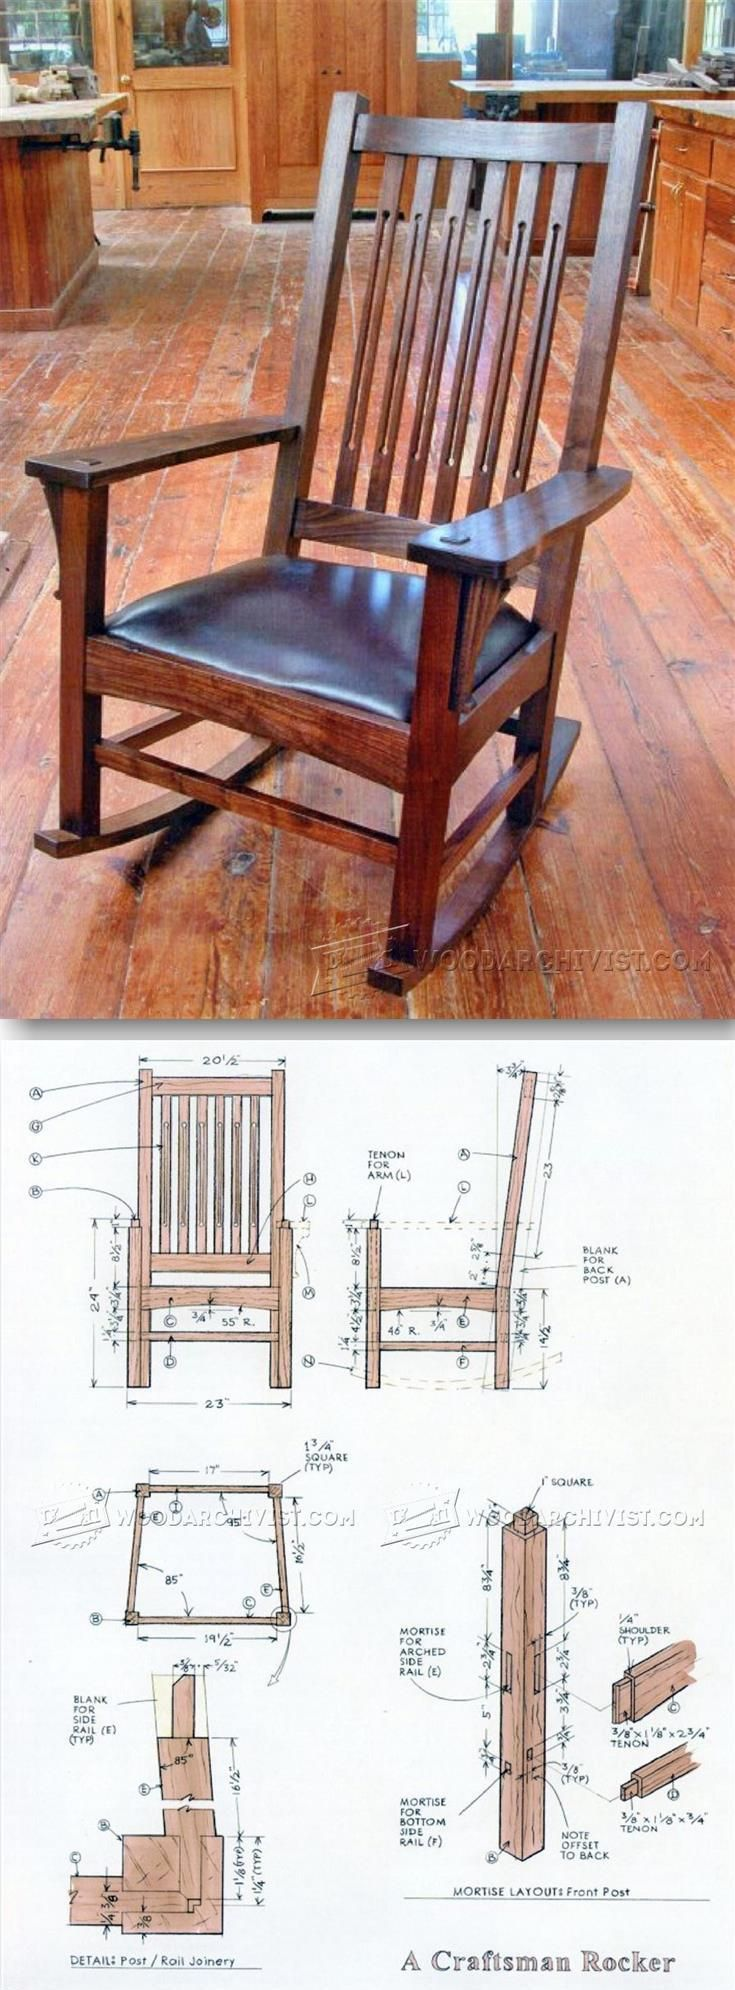 Morris chair plans - Craftsman Rocking Chair Plans Furniture Plans And Projects Woodarchivist Com